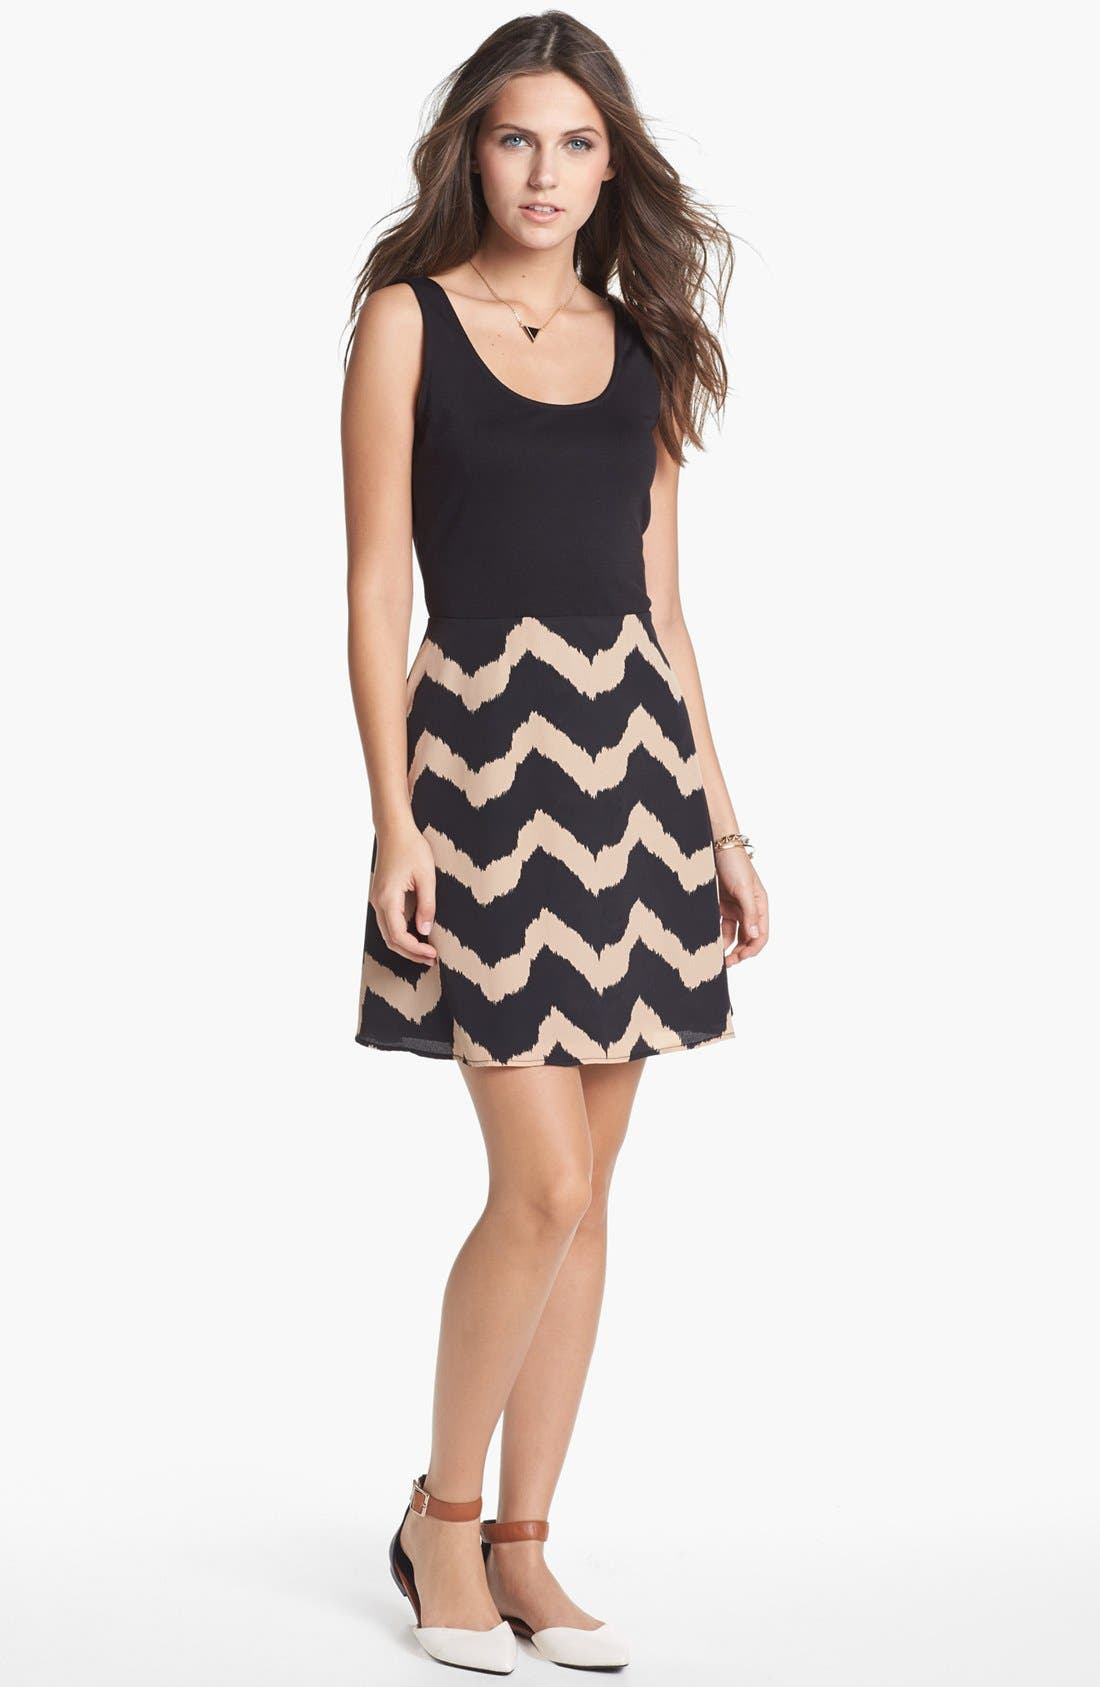 Alternate Image 1 Selected - dee elle Print Fit & Flare Dress (Juniors) (Online Only)